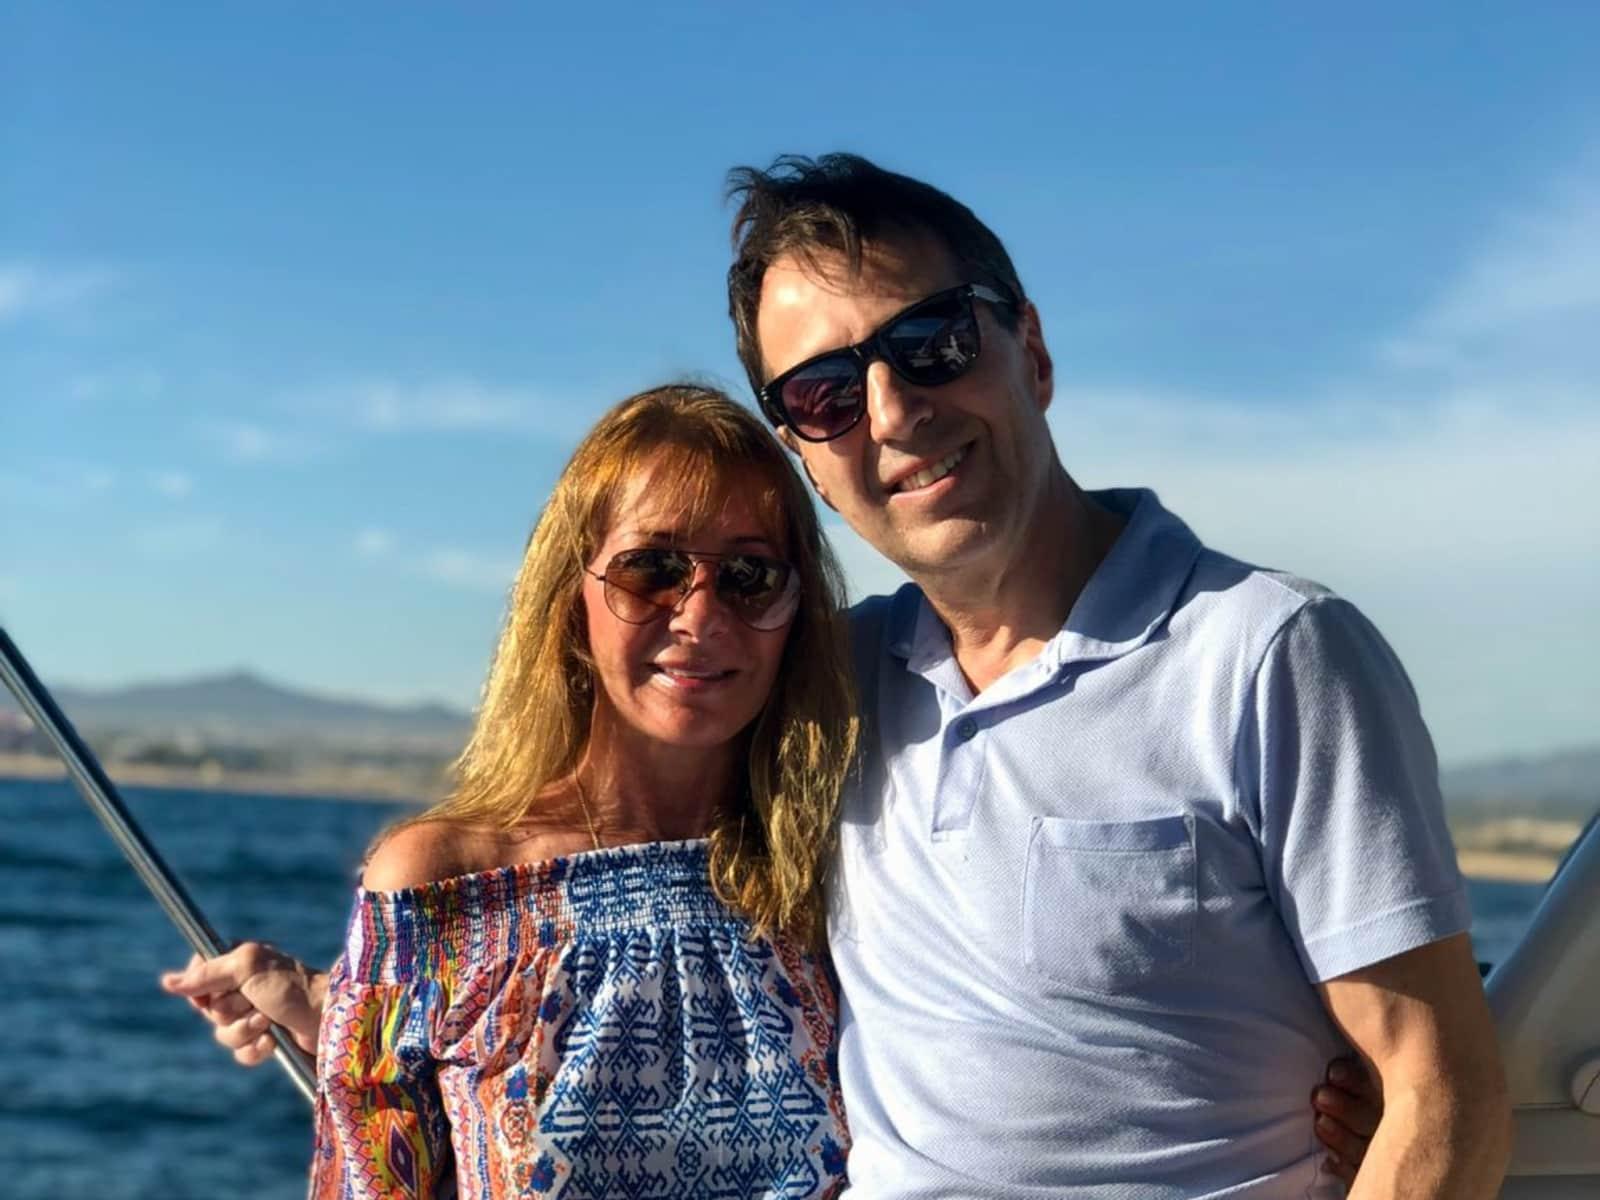 Faye & Daniel from Cherry Hills Village, Colorado, United States